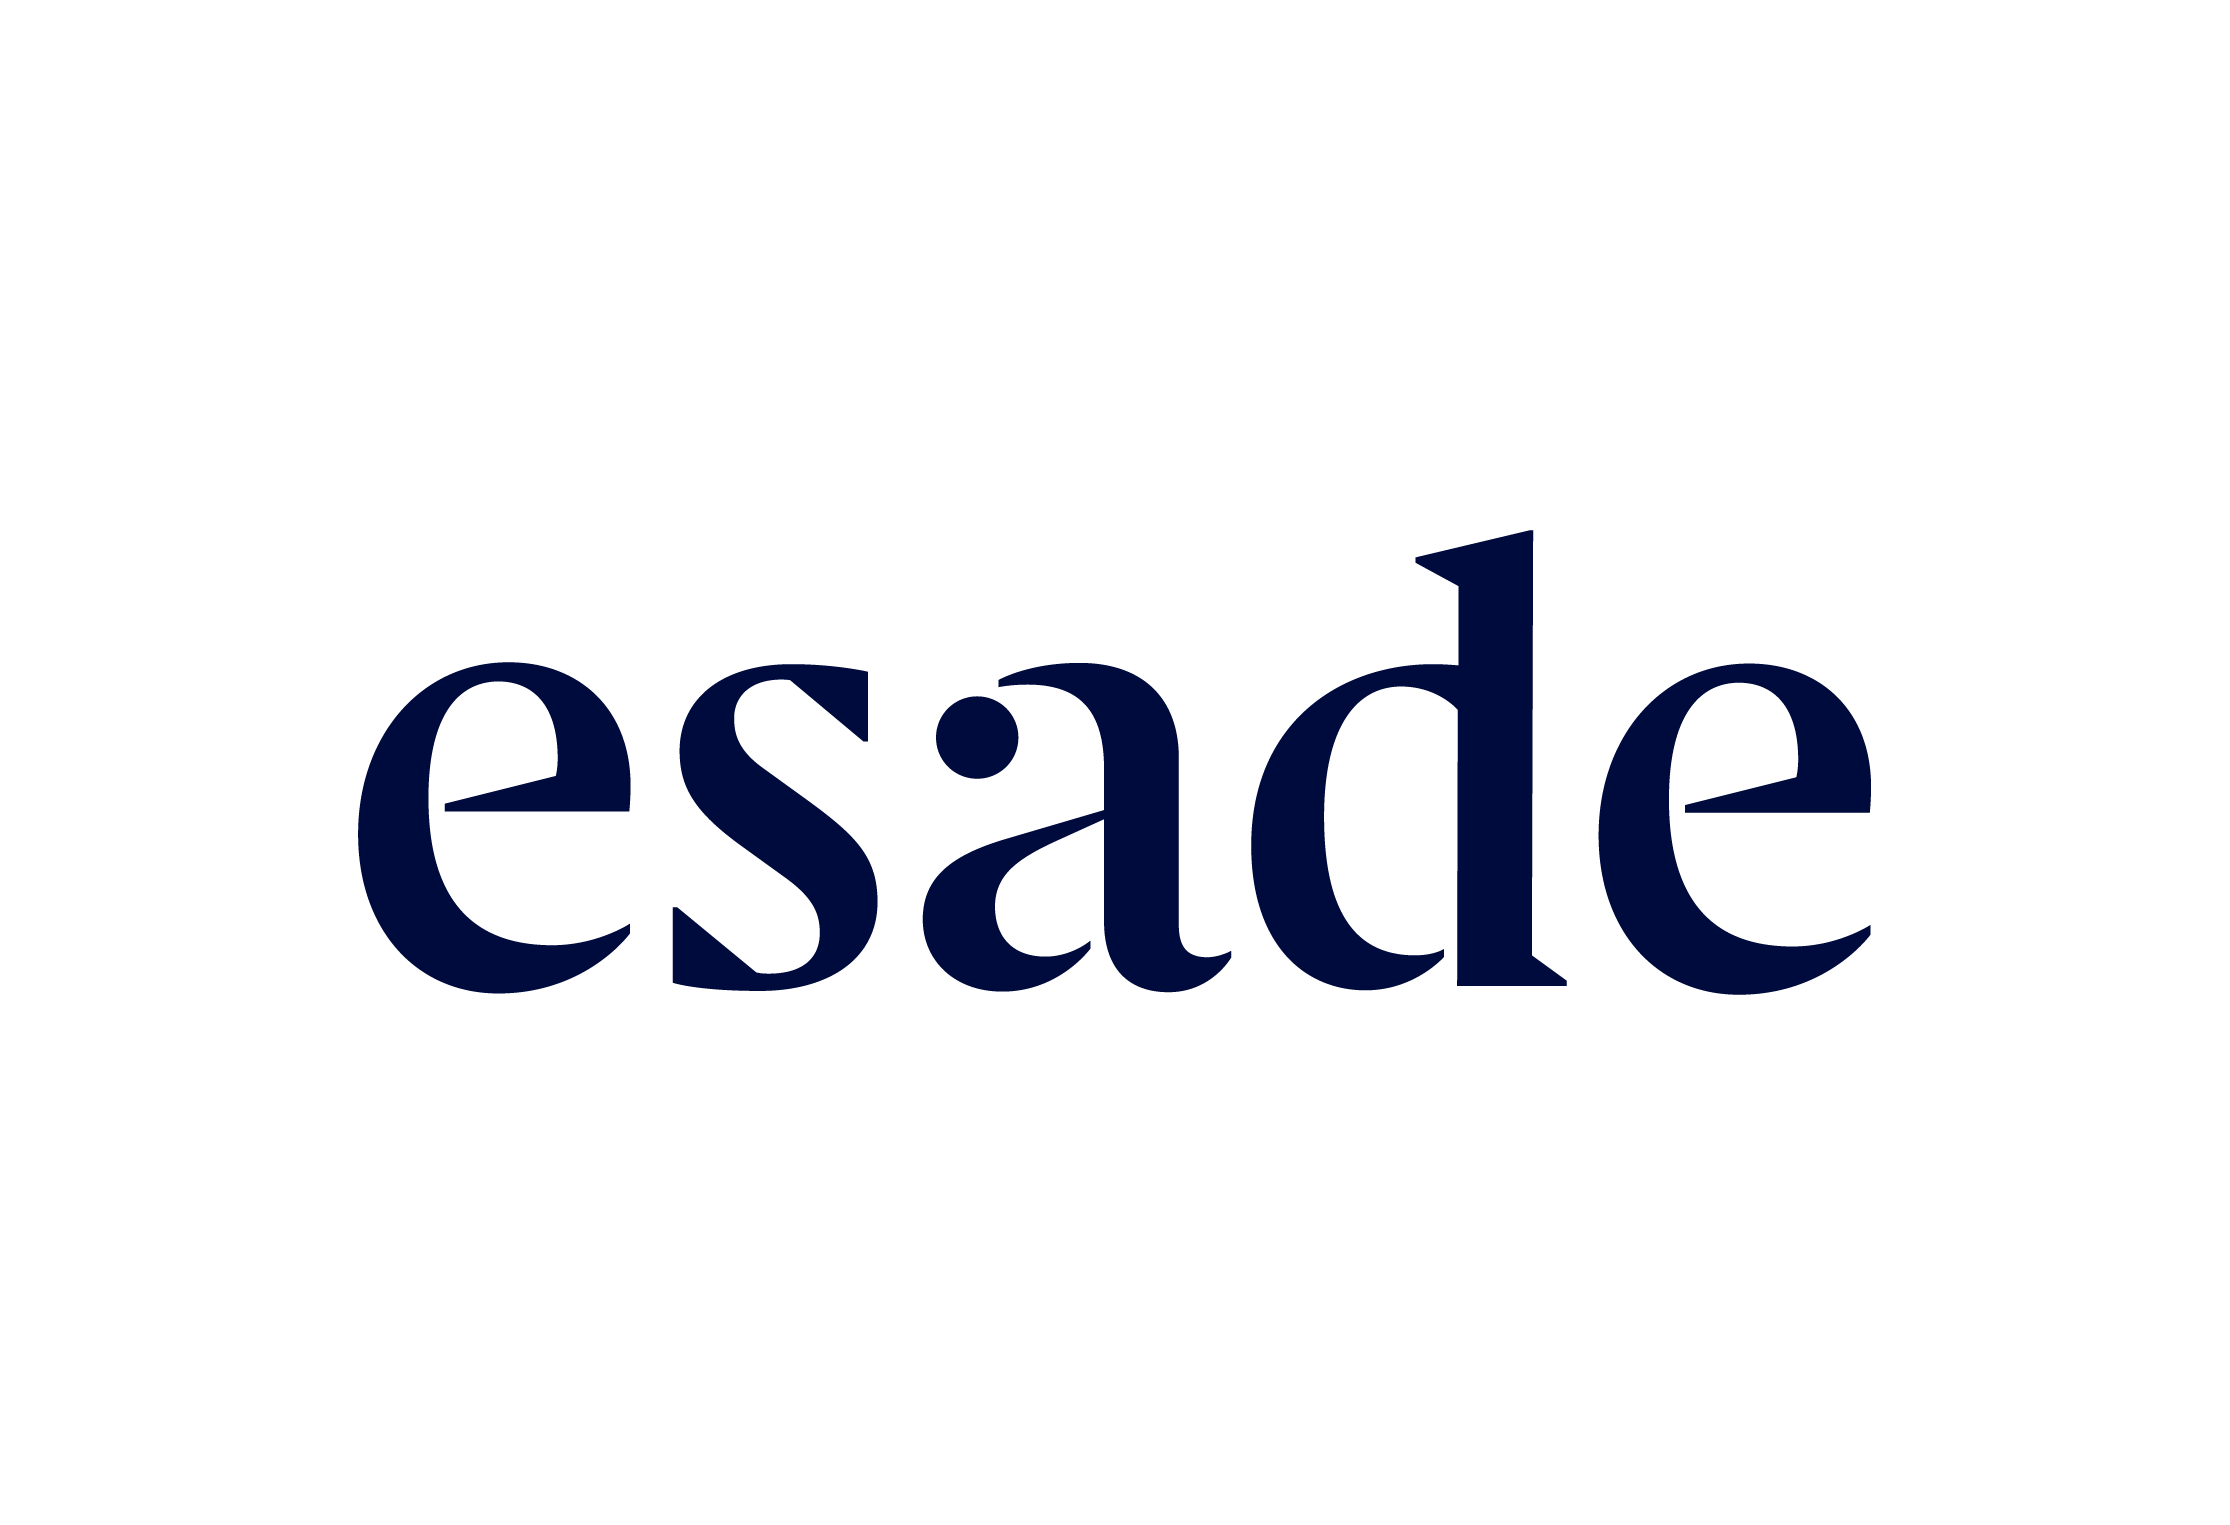 Esade's logo